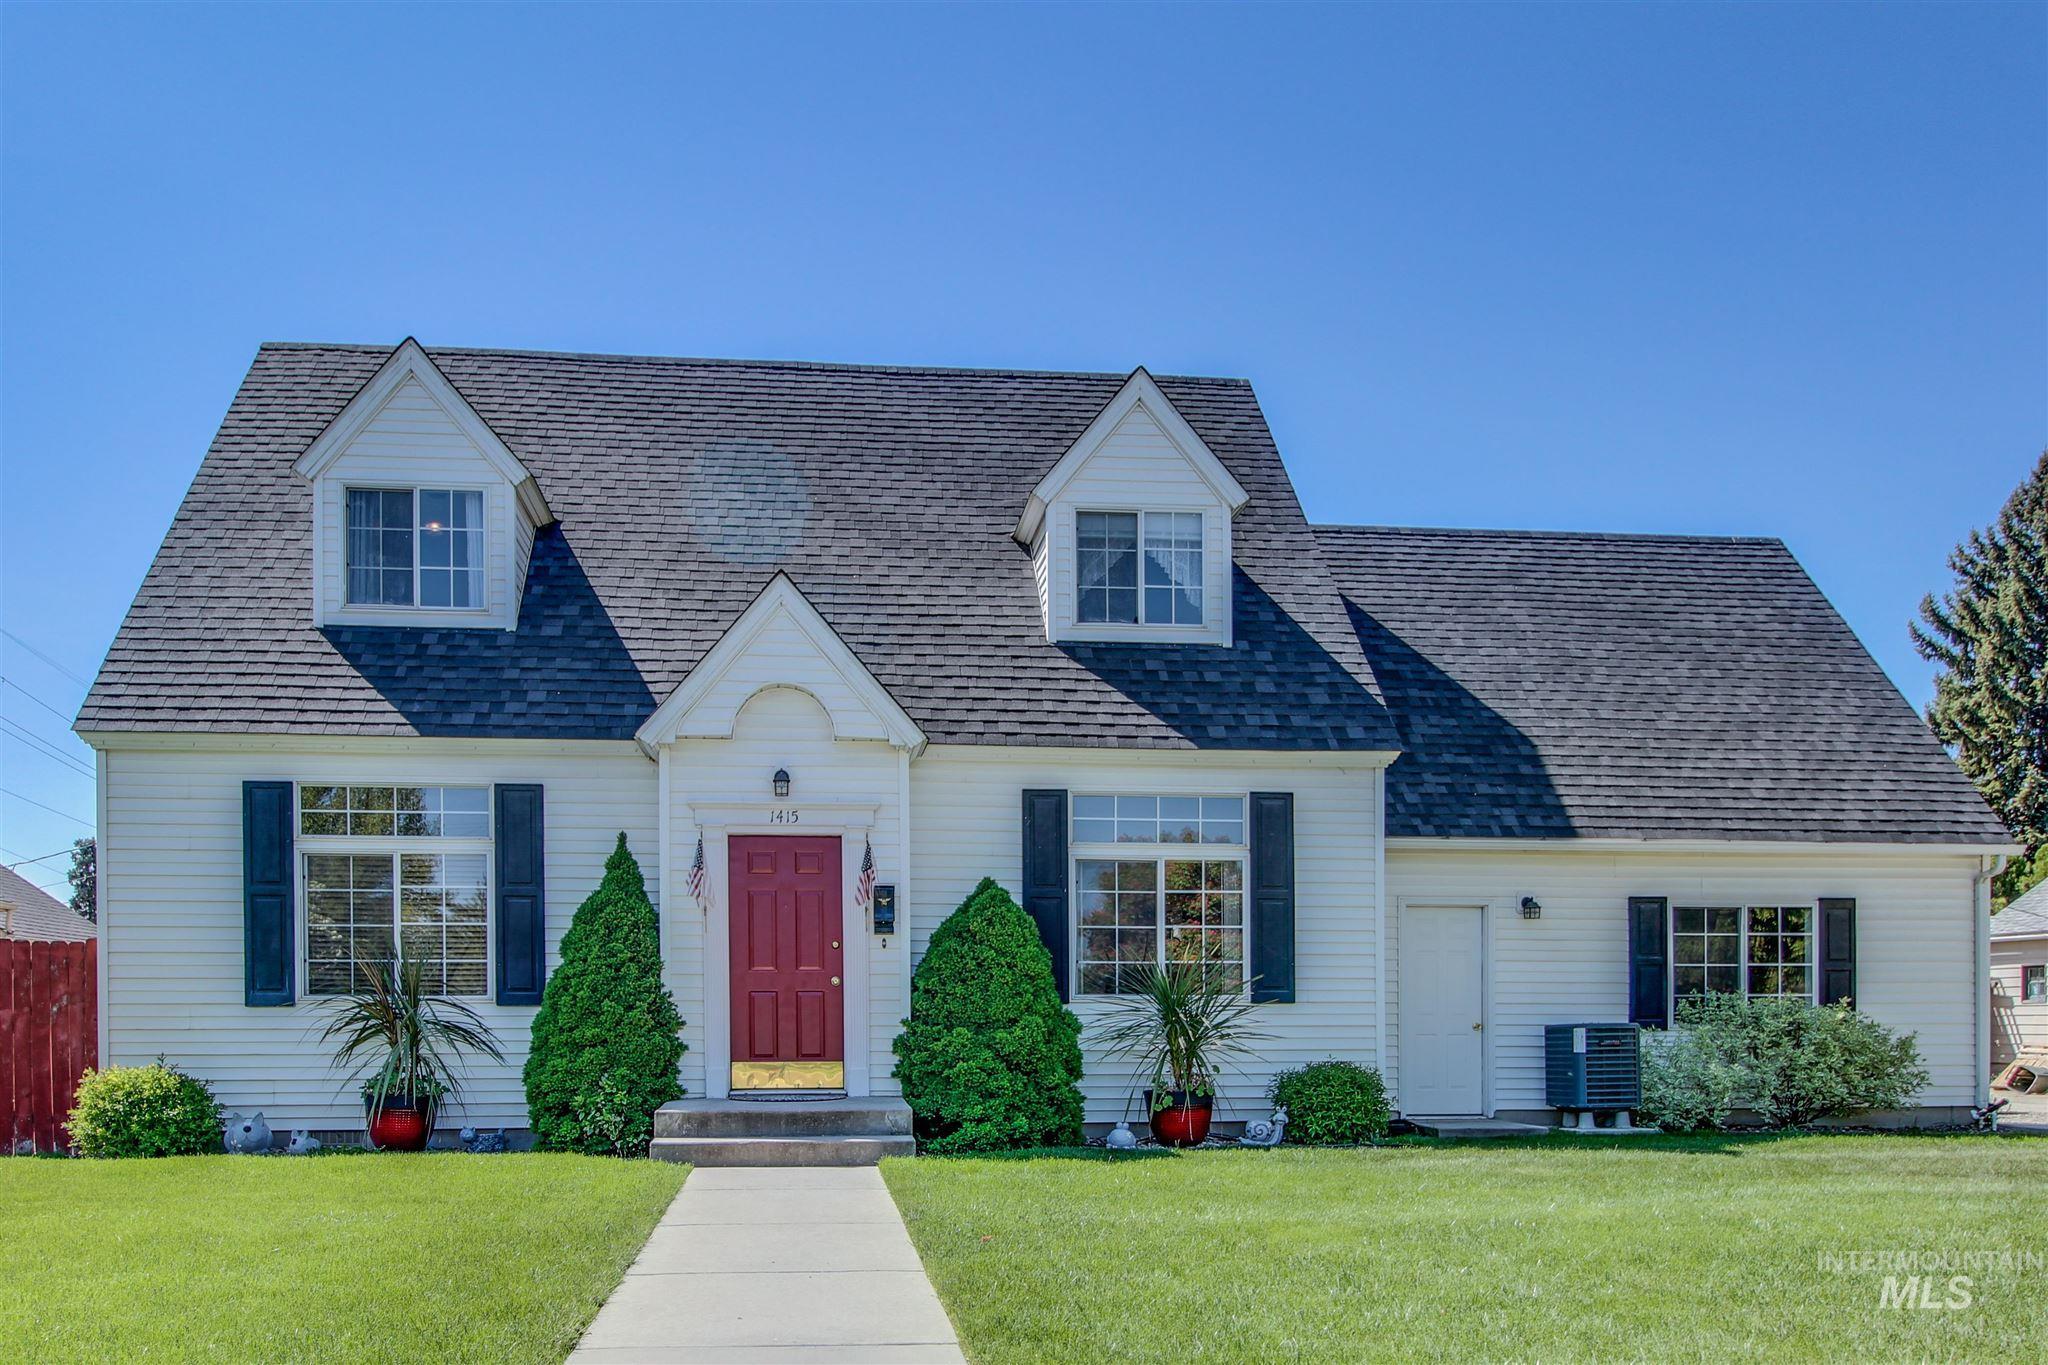 1415 E Roosevelt Ave Property Photo - Nampa, ID real estate listing